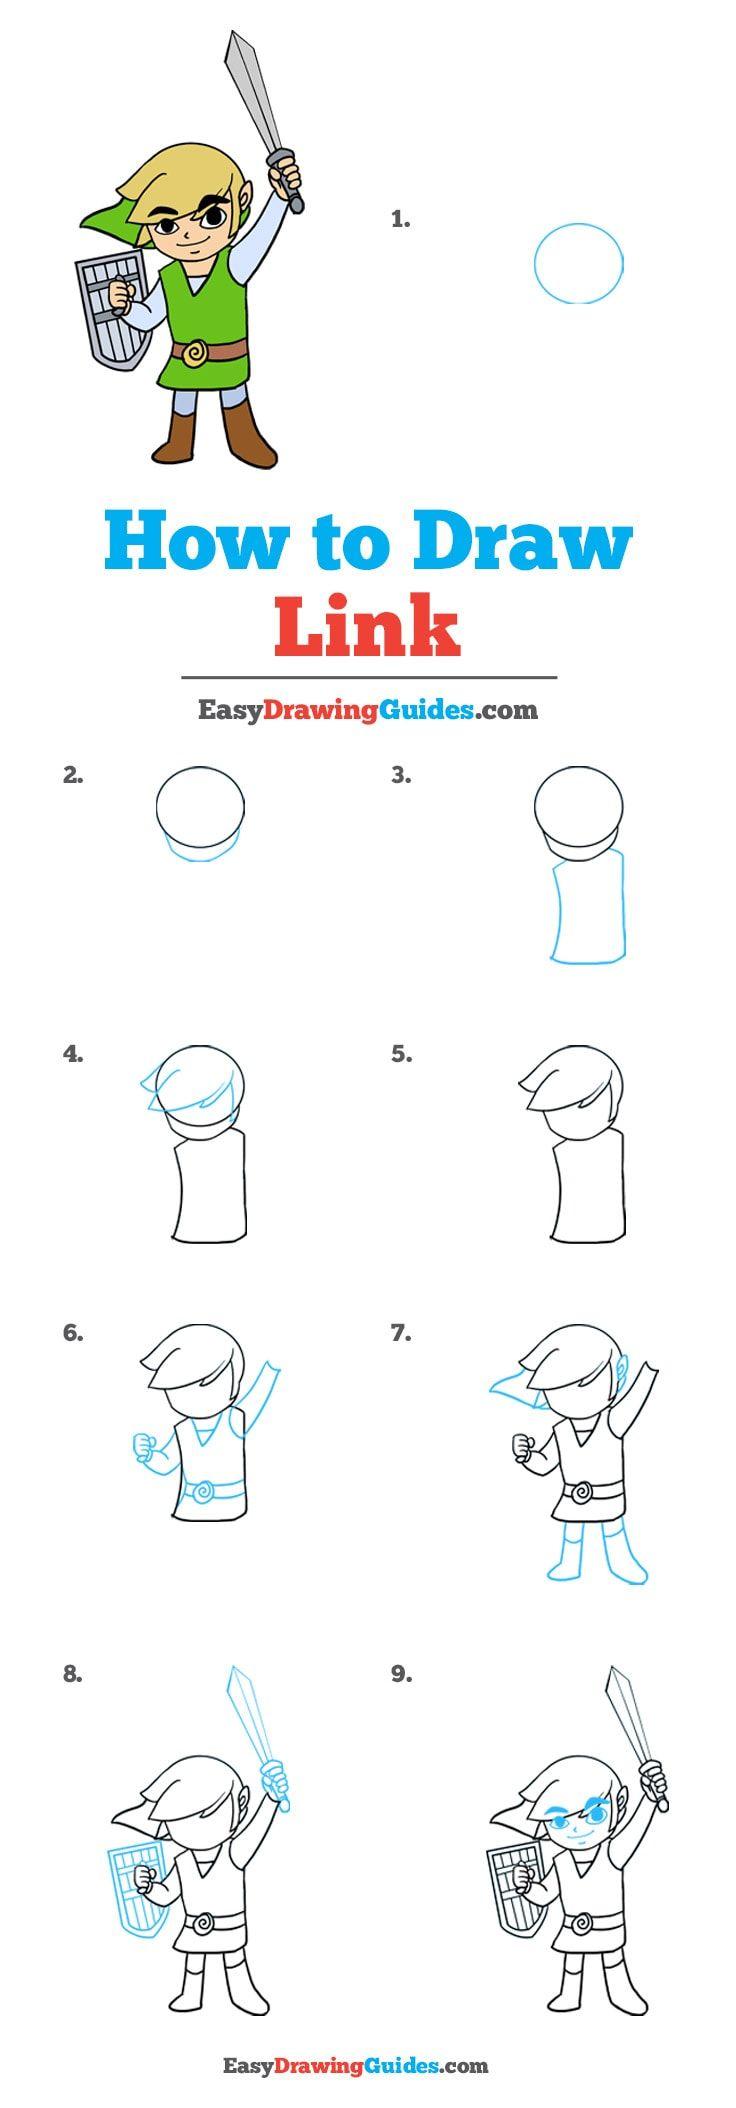 zelda draw easy link drawing games step tutorial drawings paintingvalley tutorials sword really